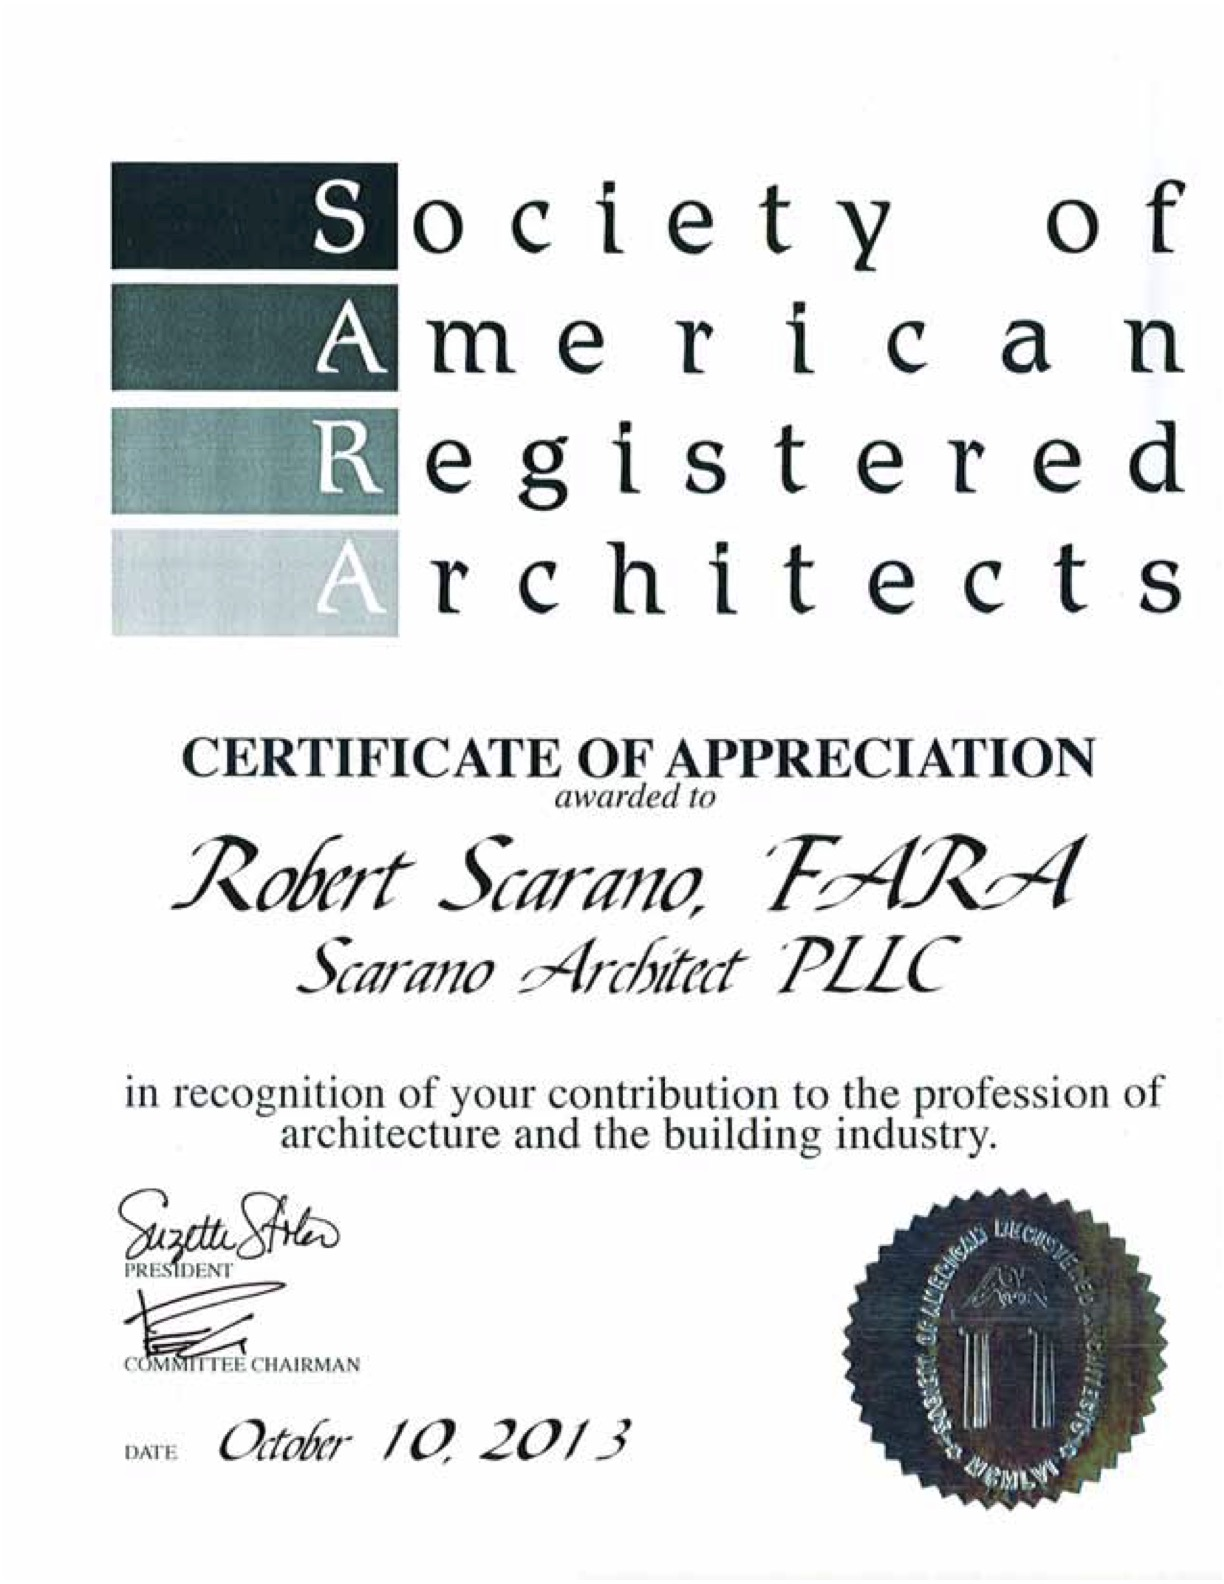 Scarano Architect